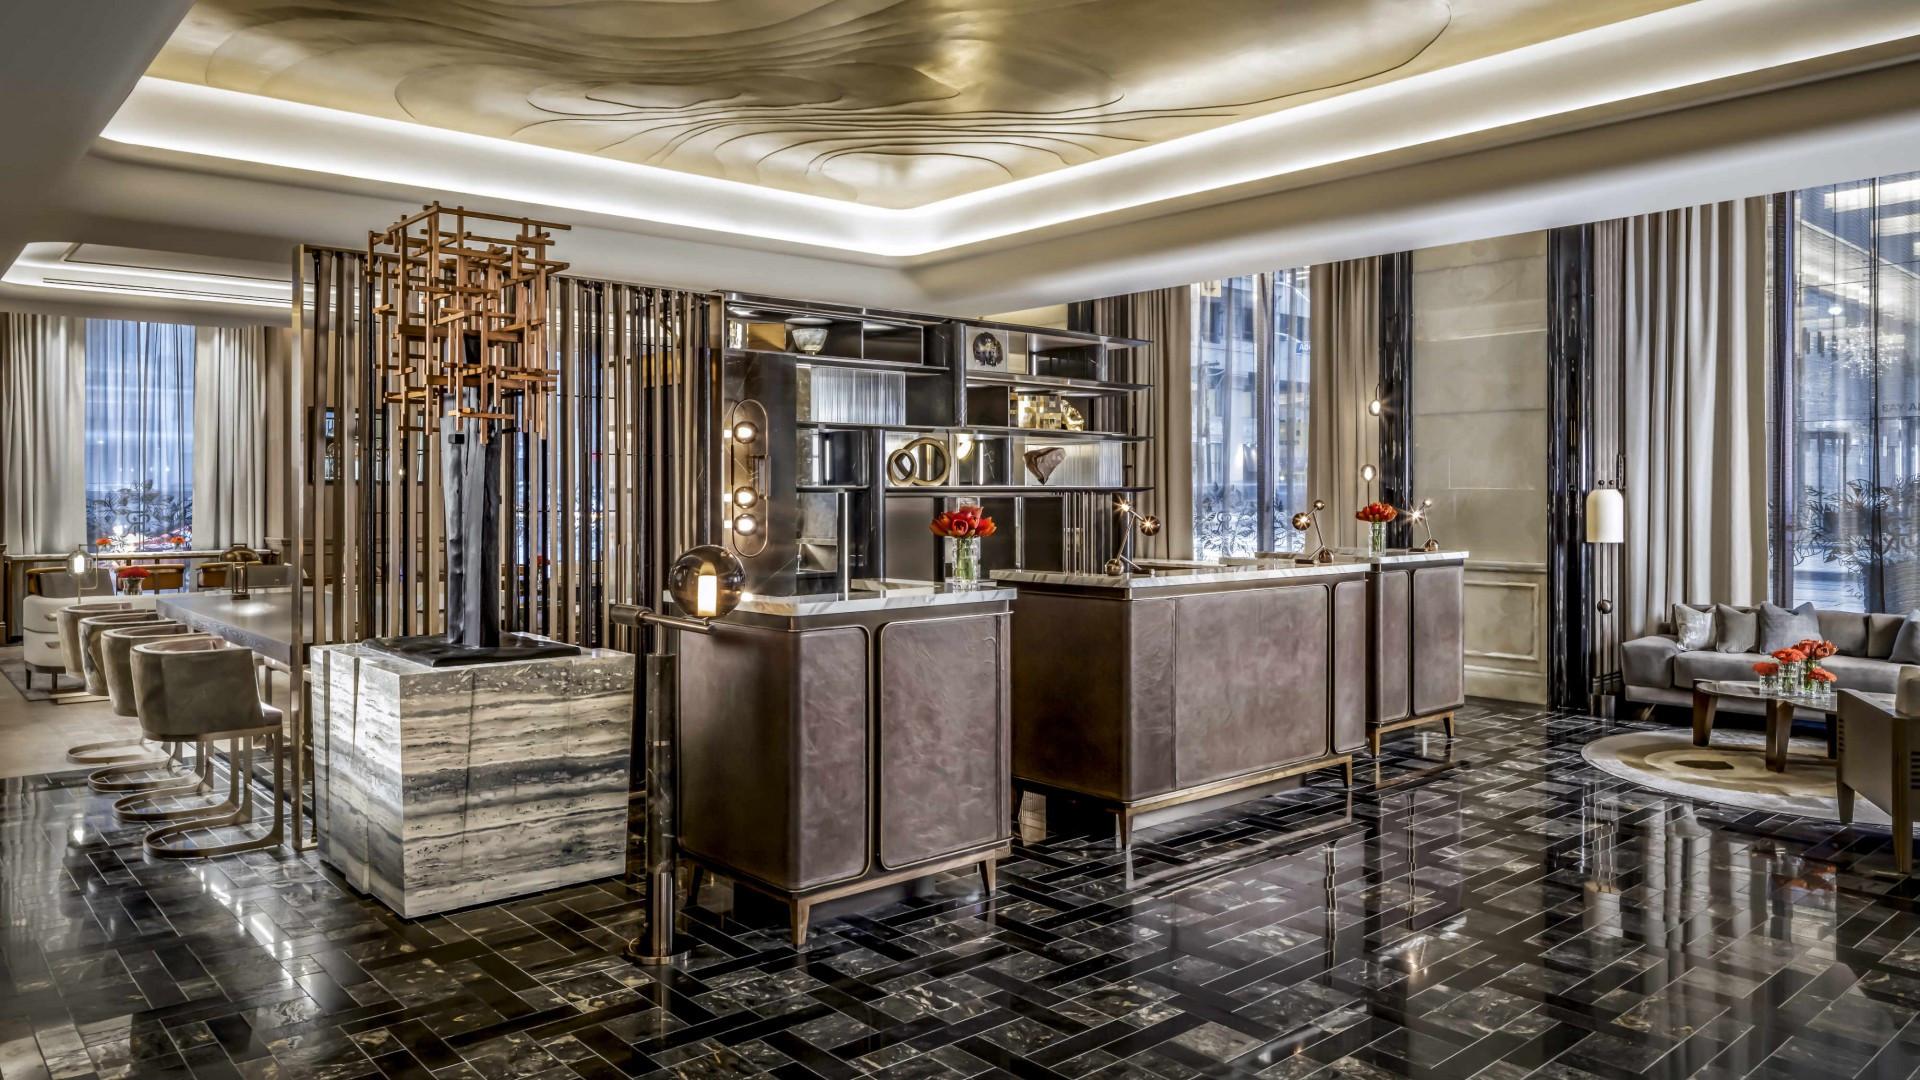 Best hotels Toronto staycation | The St. Regis Hotel main entrance lobby